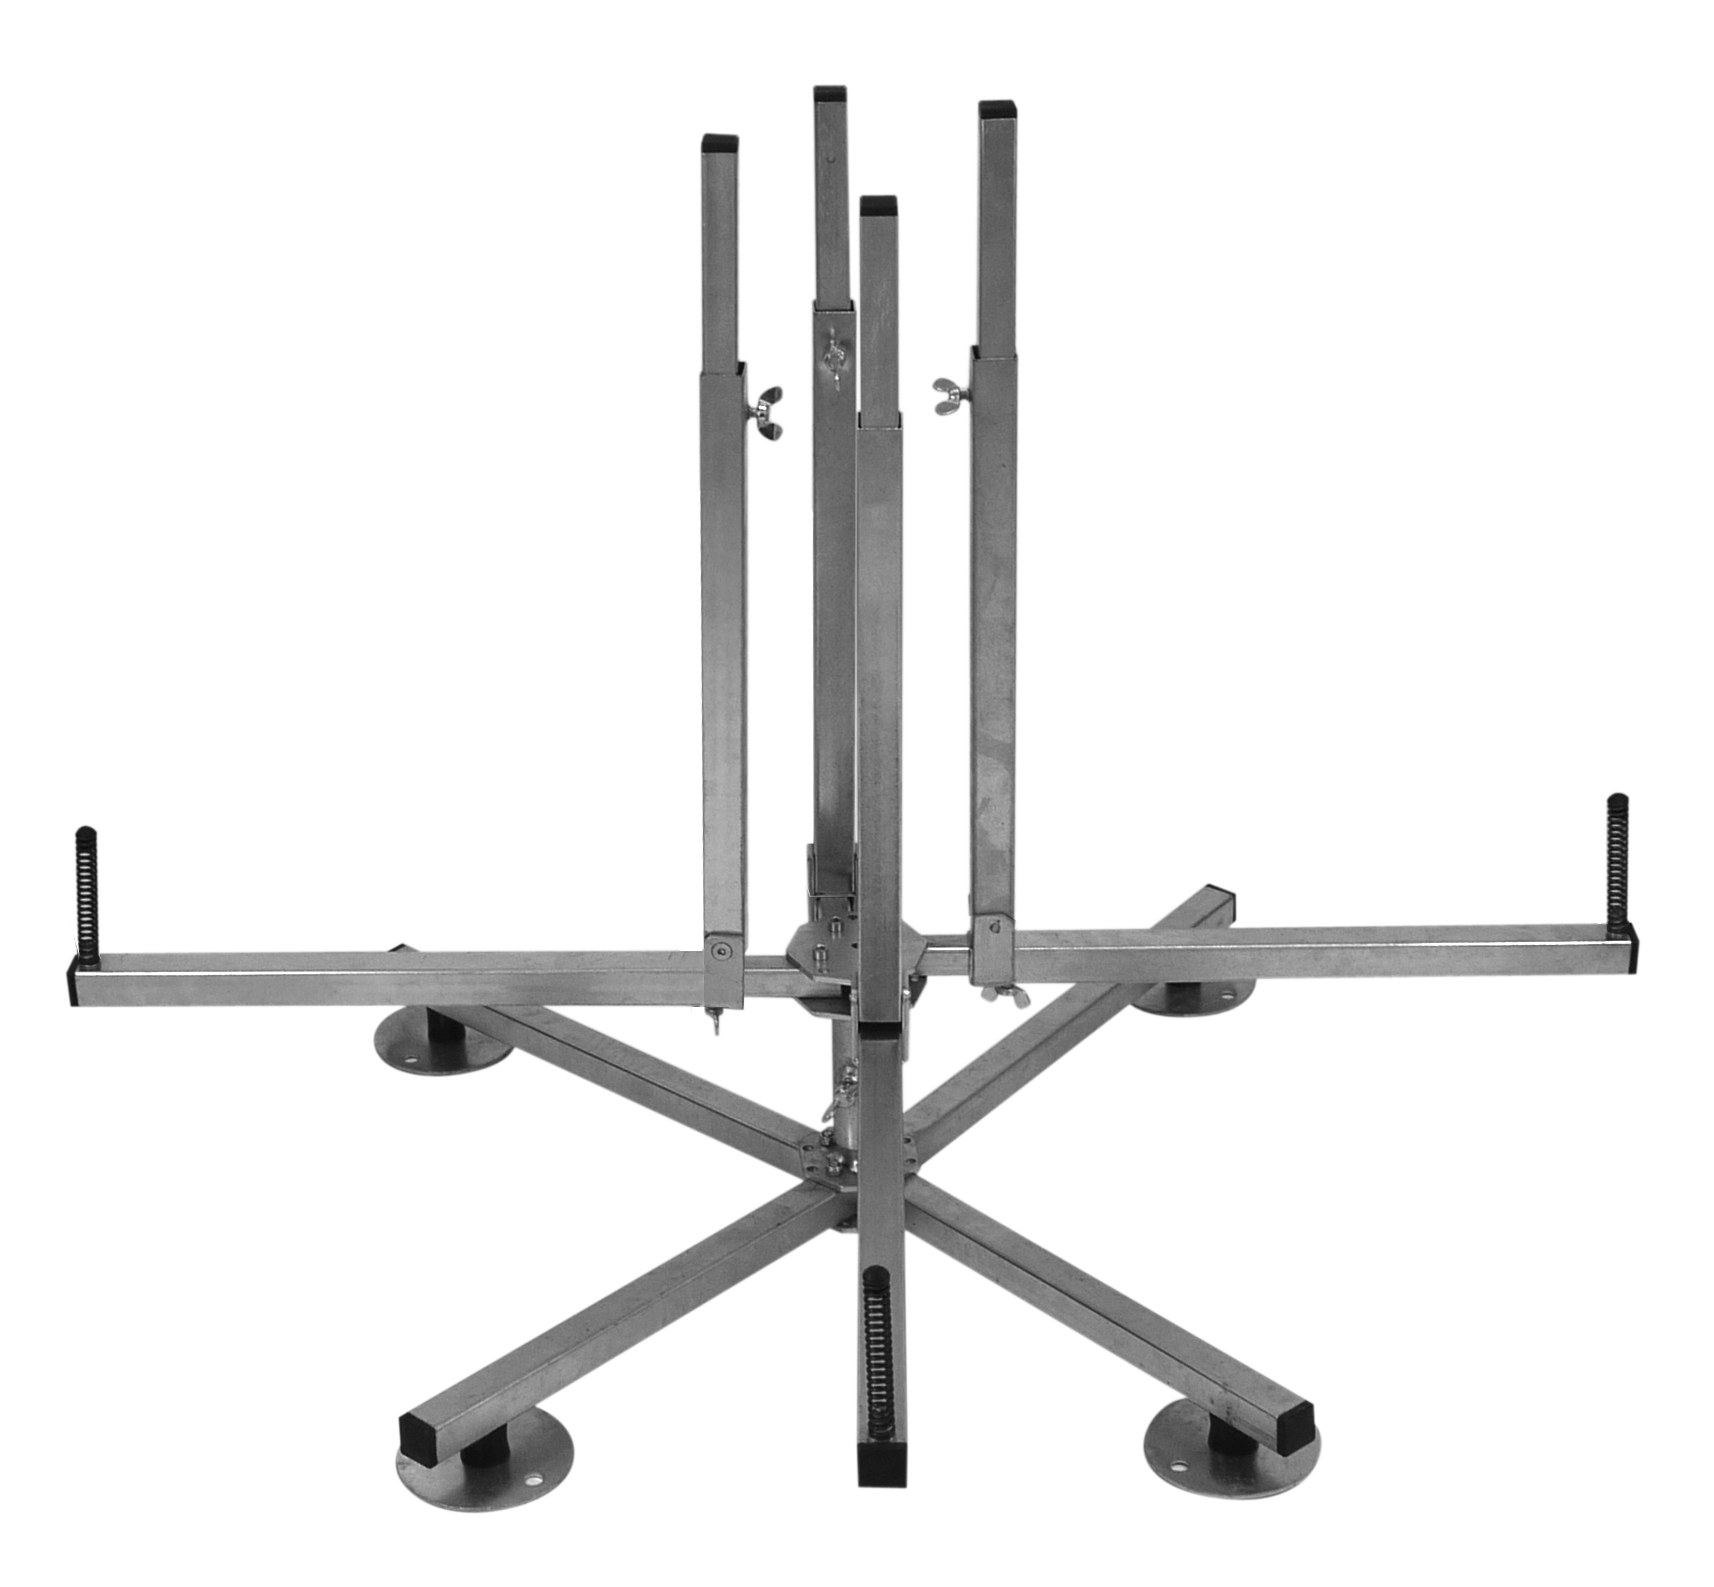 profi heizrohr abroller f r fbh rohr 14 bis 20 mm shk haustechnik shop kuchar. Black Bedroom Furniture Sets. Home Design Ideas